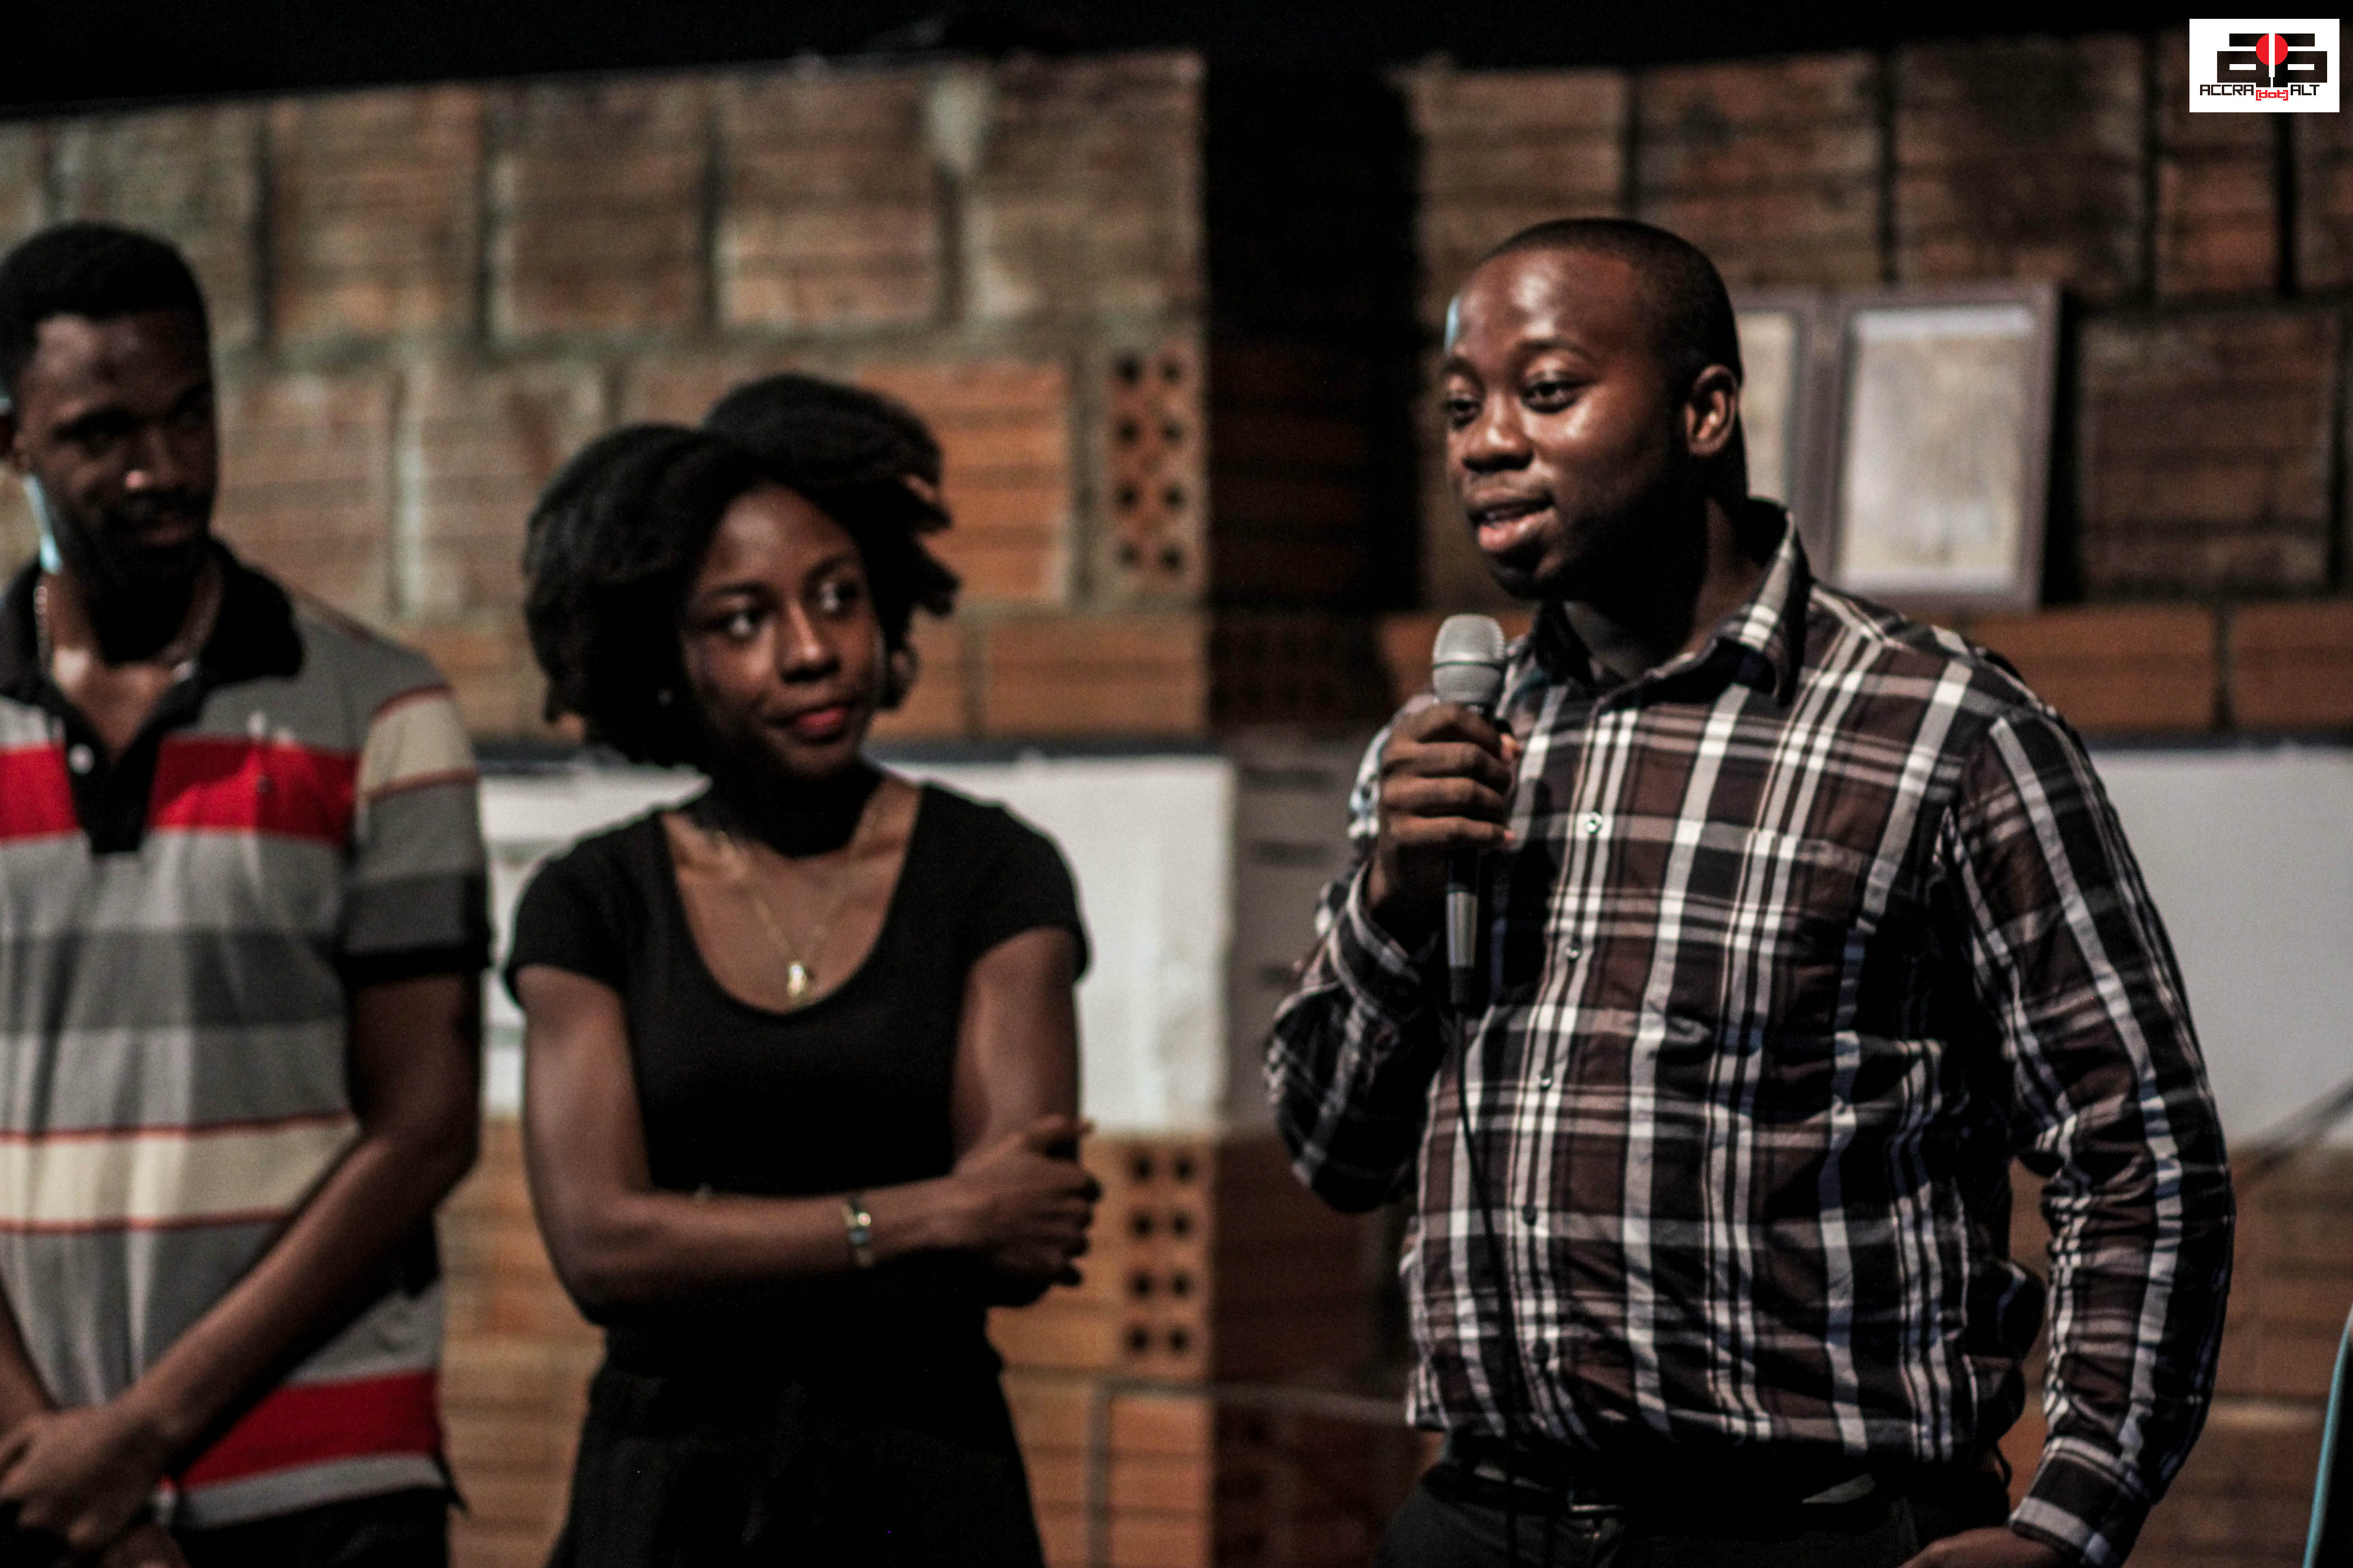 Emmanuel Deegbe (playwright)